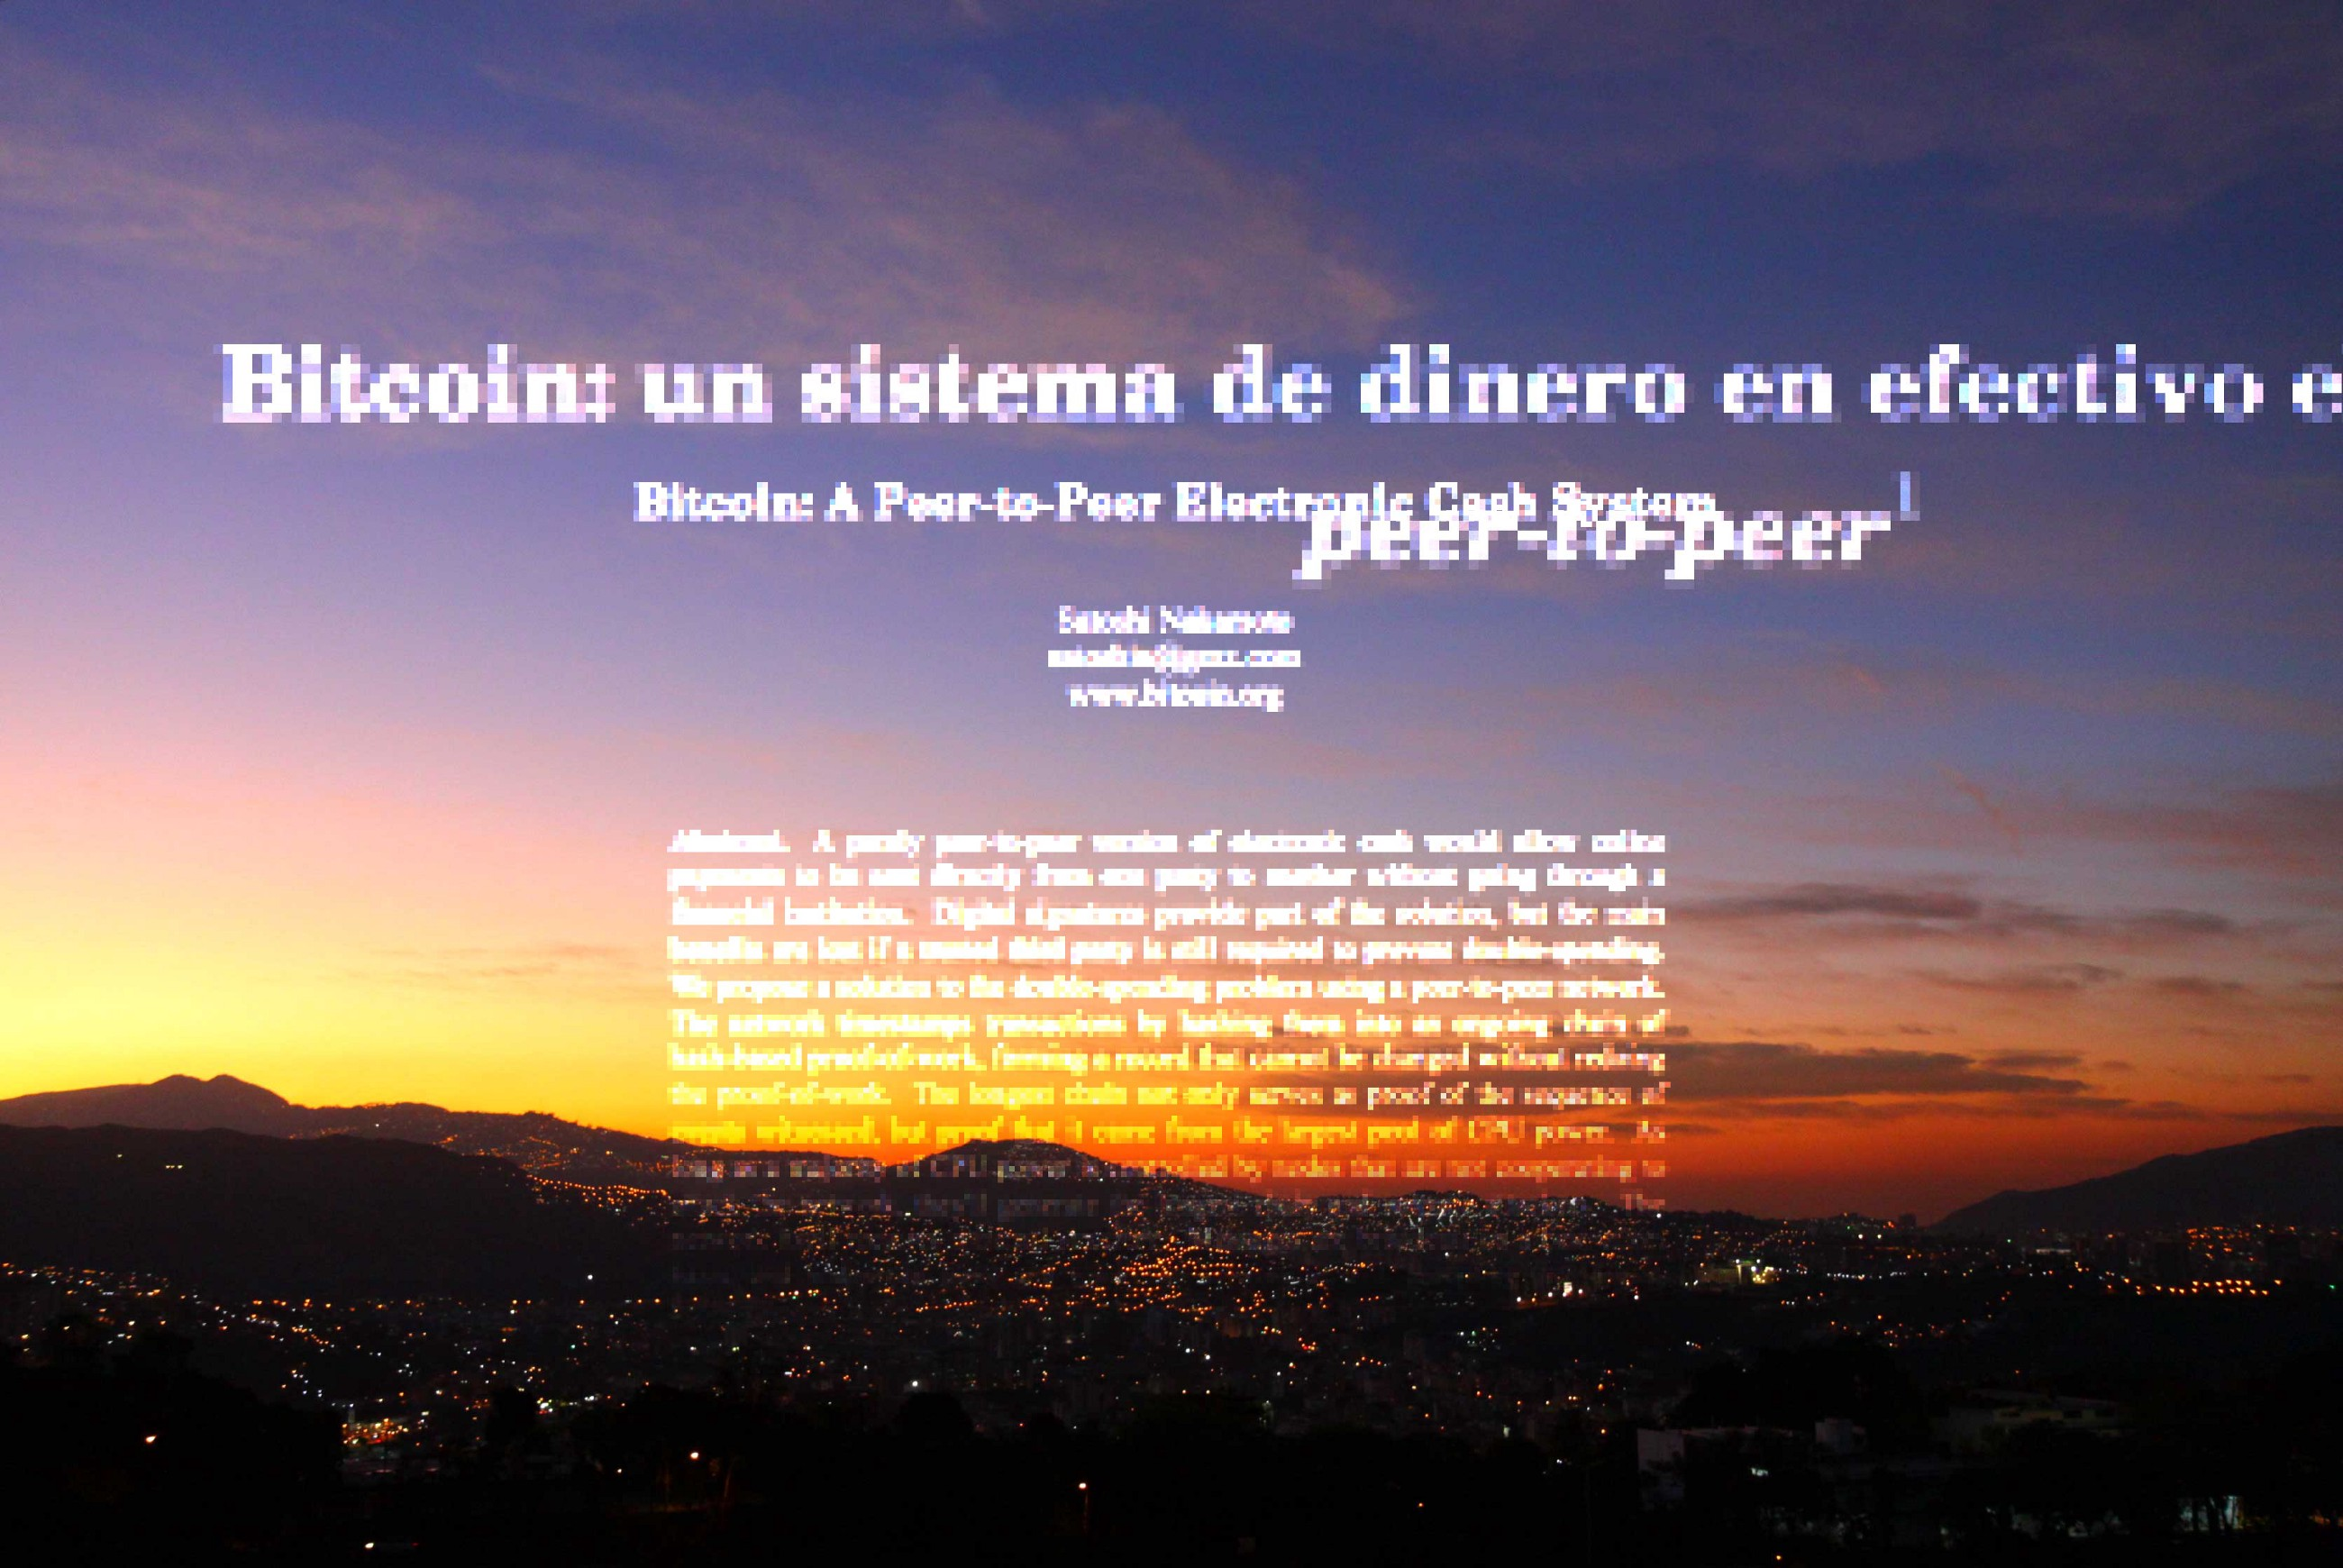 /dystopias-philosophies-and-cryptocurrencies-venezuela-earth-19866bcb82c feature image